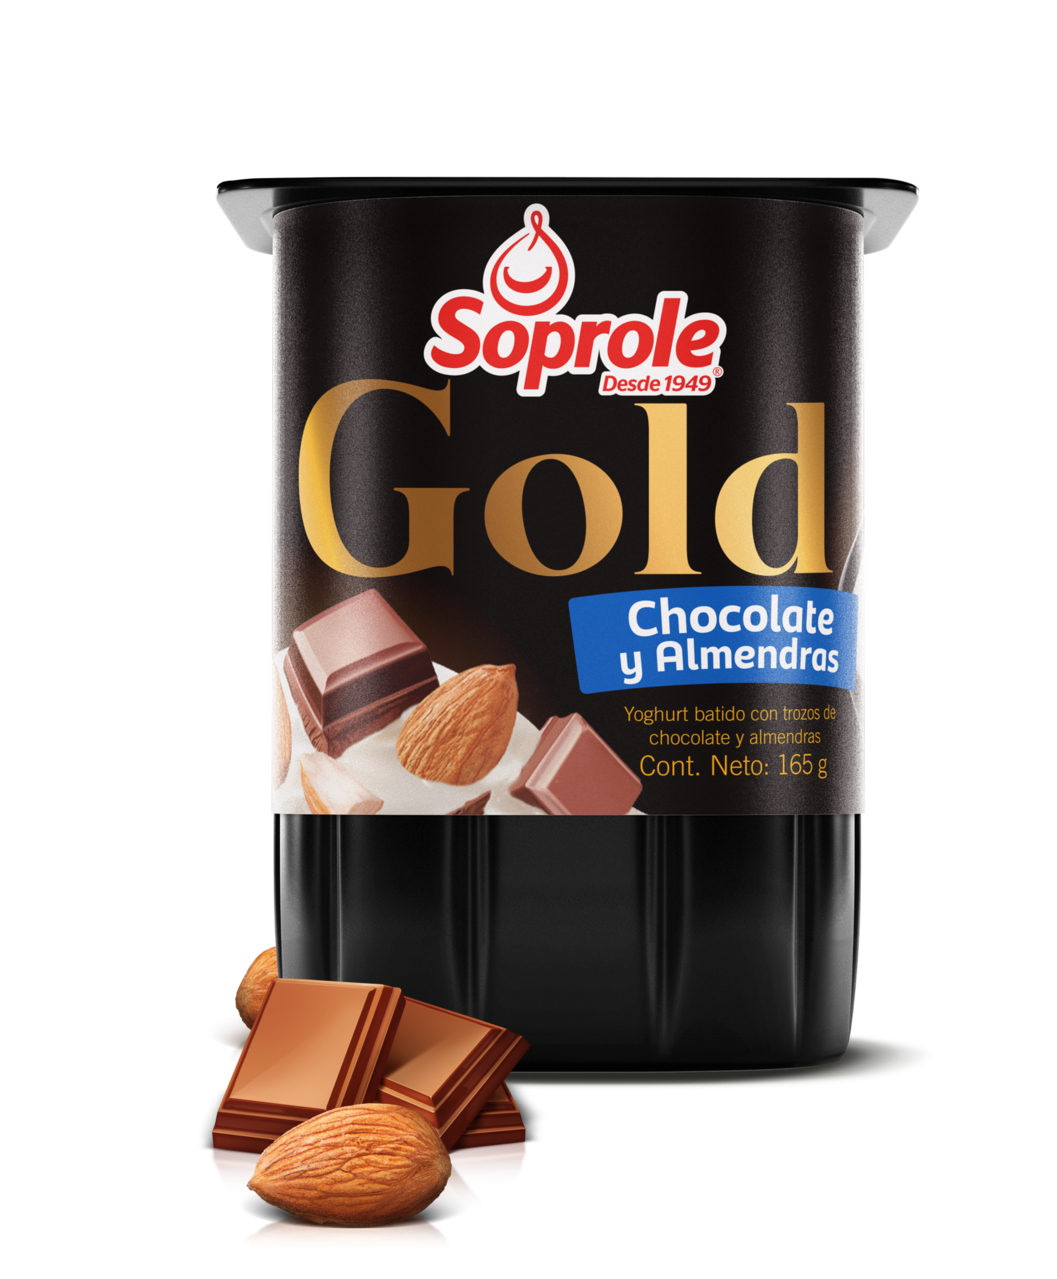 Soprole Gold Yoghurt Chocolate Almendras